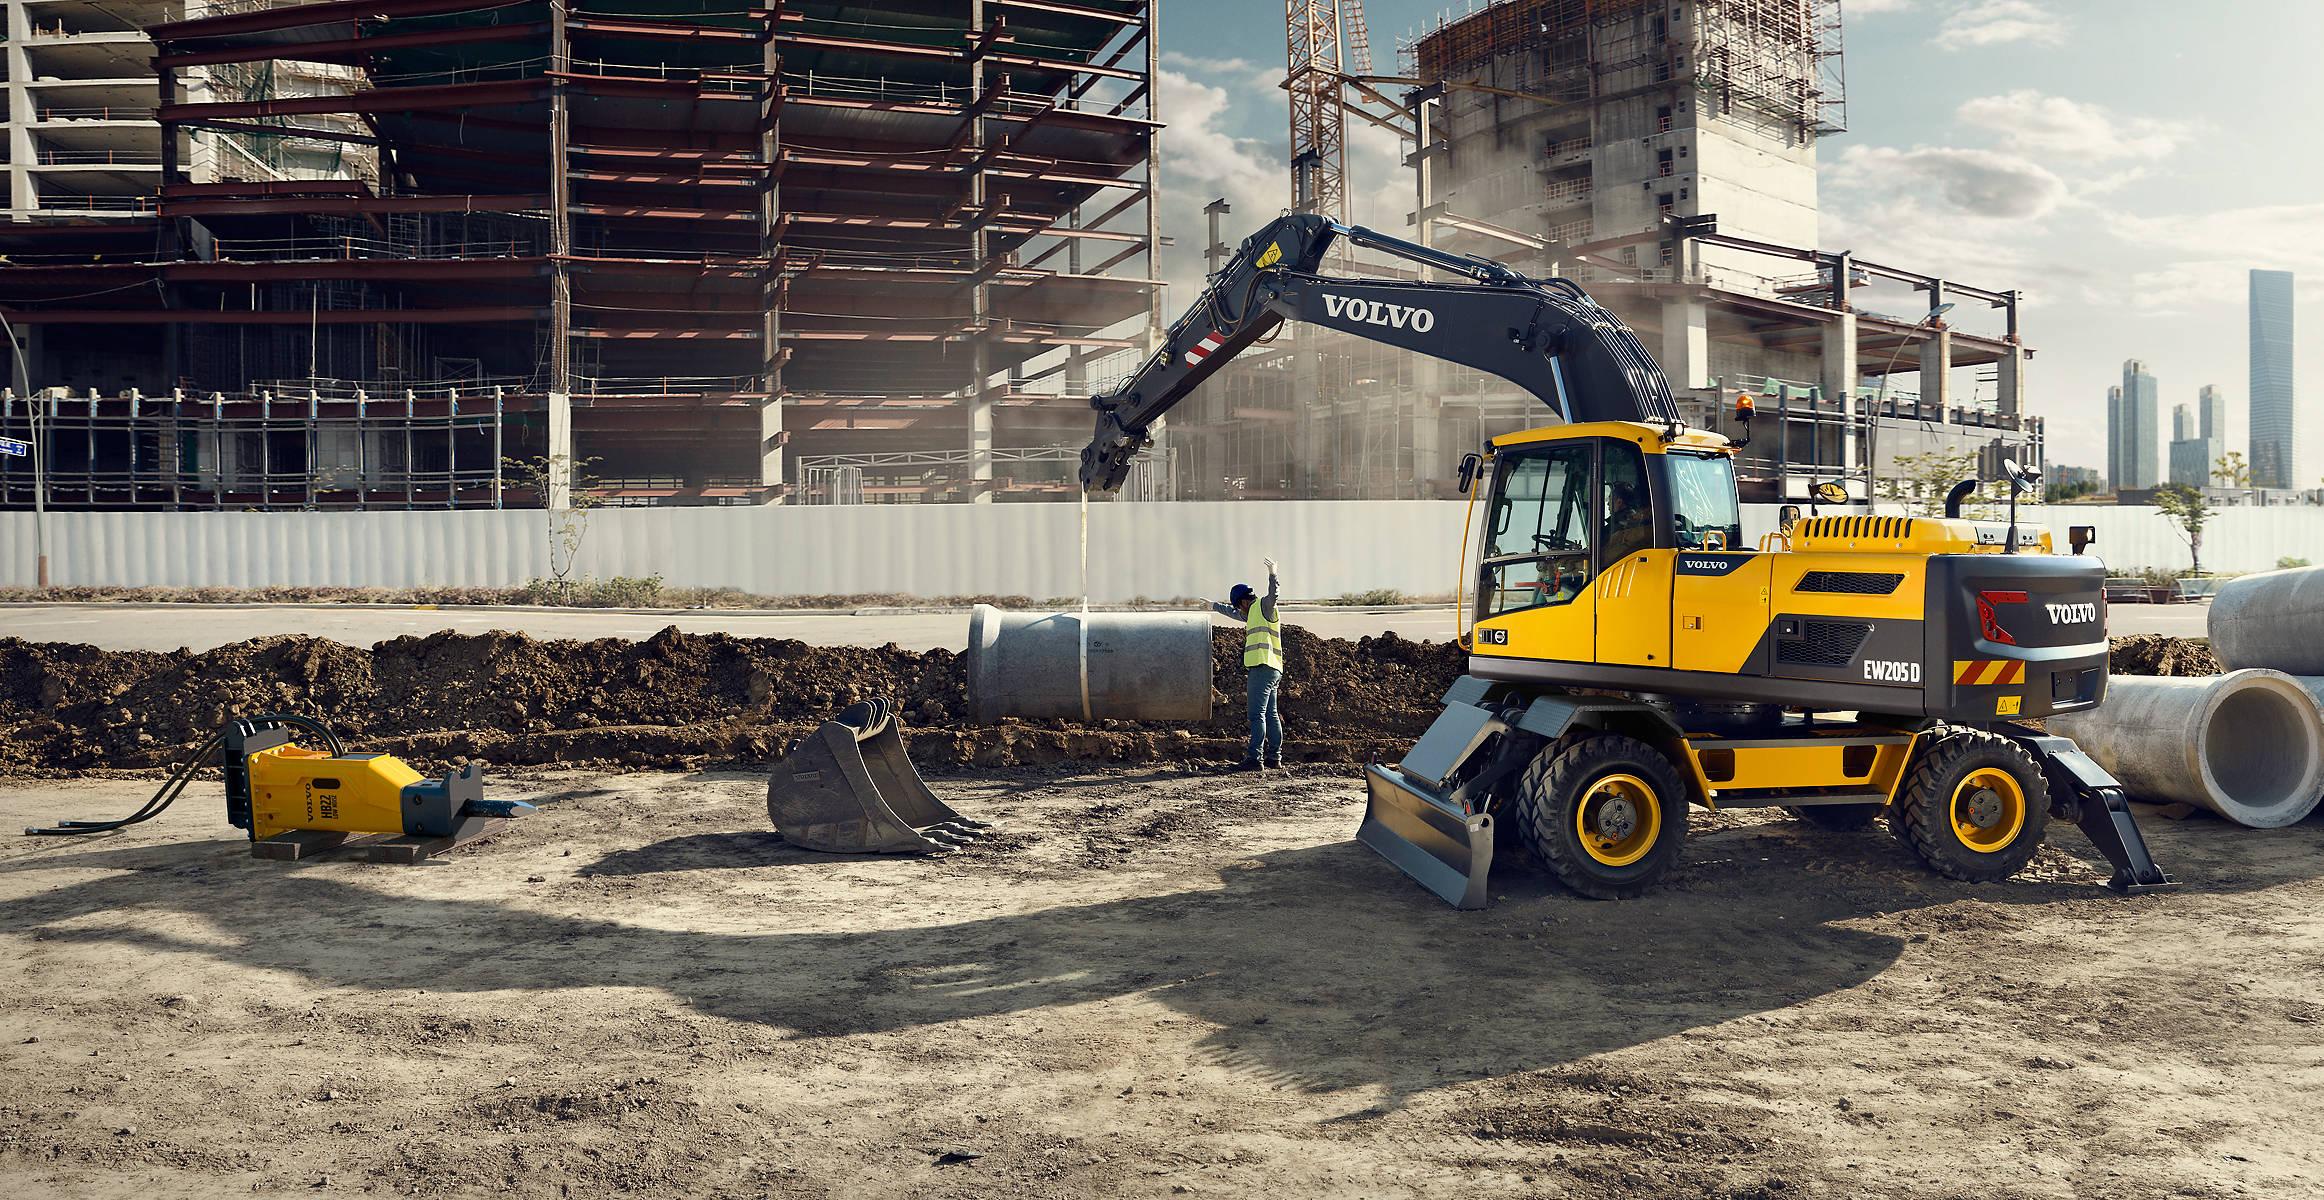 Ew205d Wheeled Excavators Overview Volvo Construction Equipment